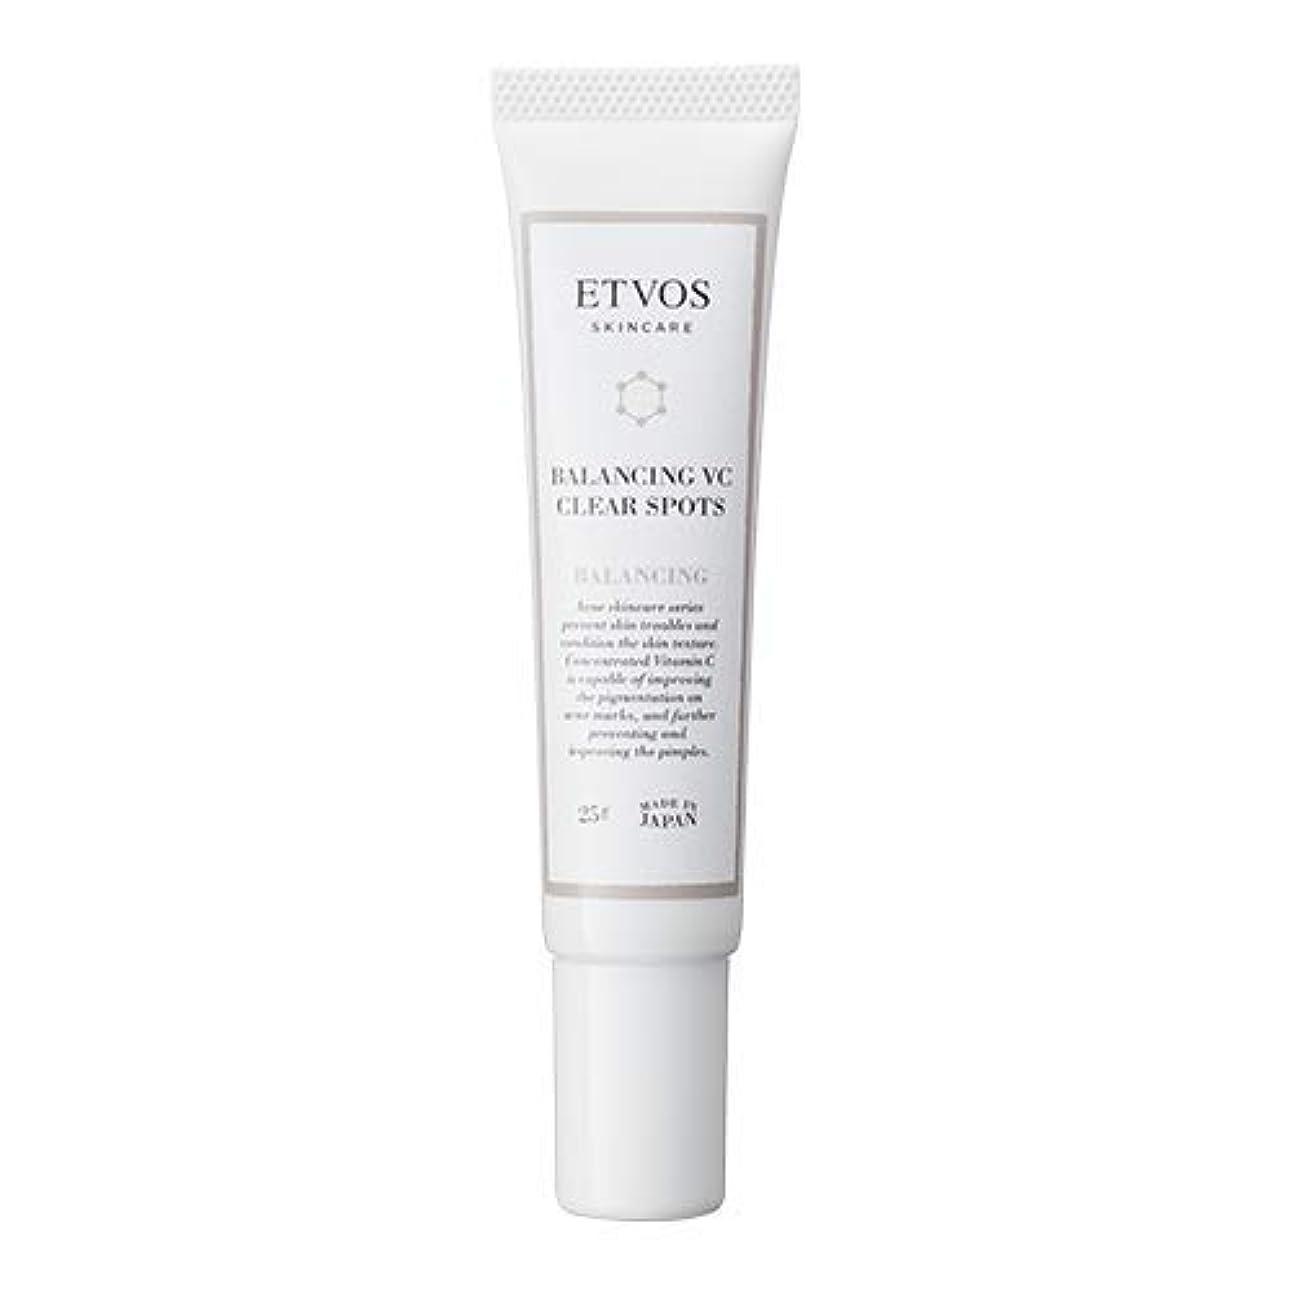 ETVOS(エトヴォス) 肌荒れ防止美容液 バランシングVCクリアスポッツ 25g アゼライン酸 おでこ/あご/頭皮